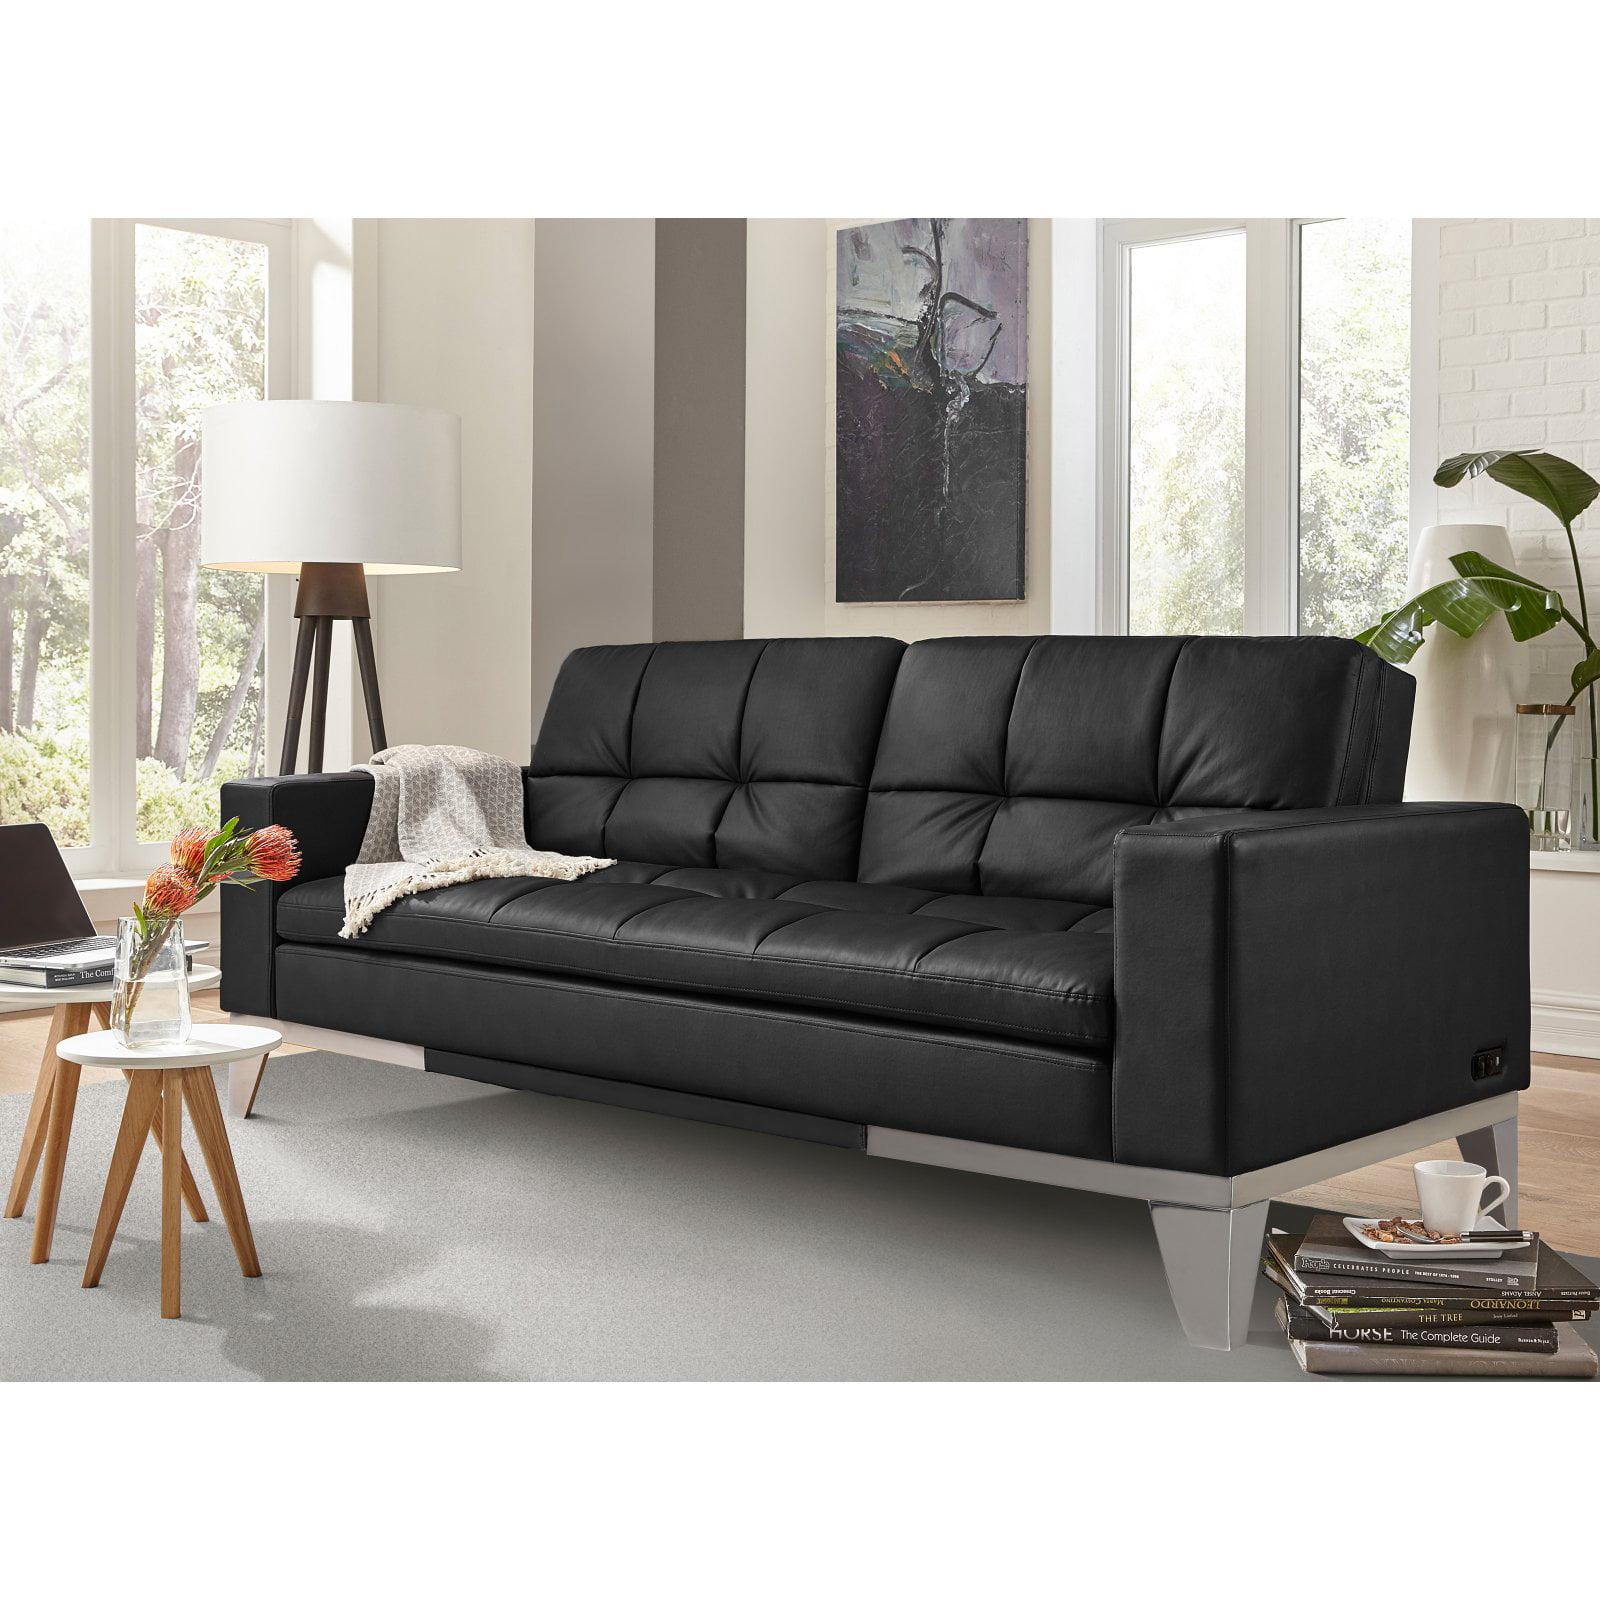 Relax A Lounger Westley Convertible Sofa   Walmart.com ...